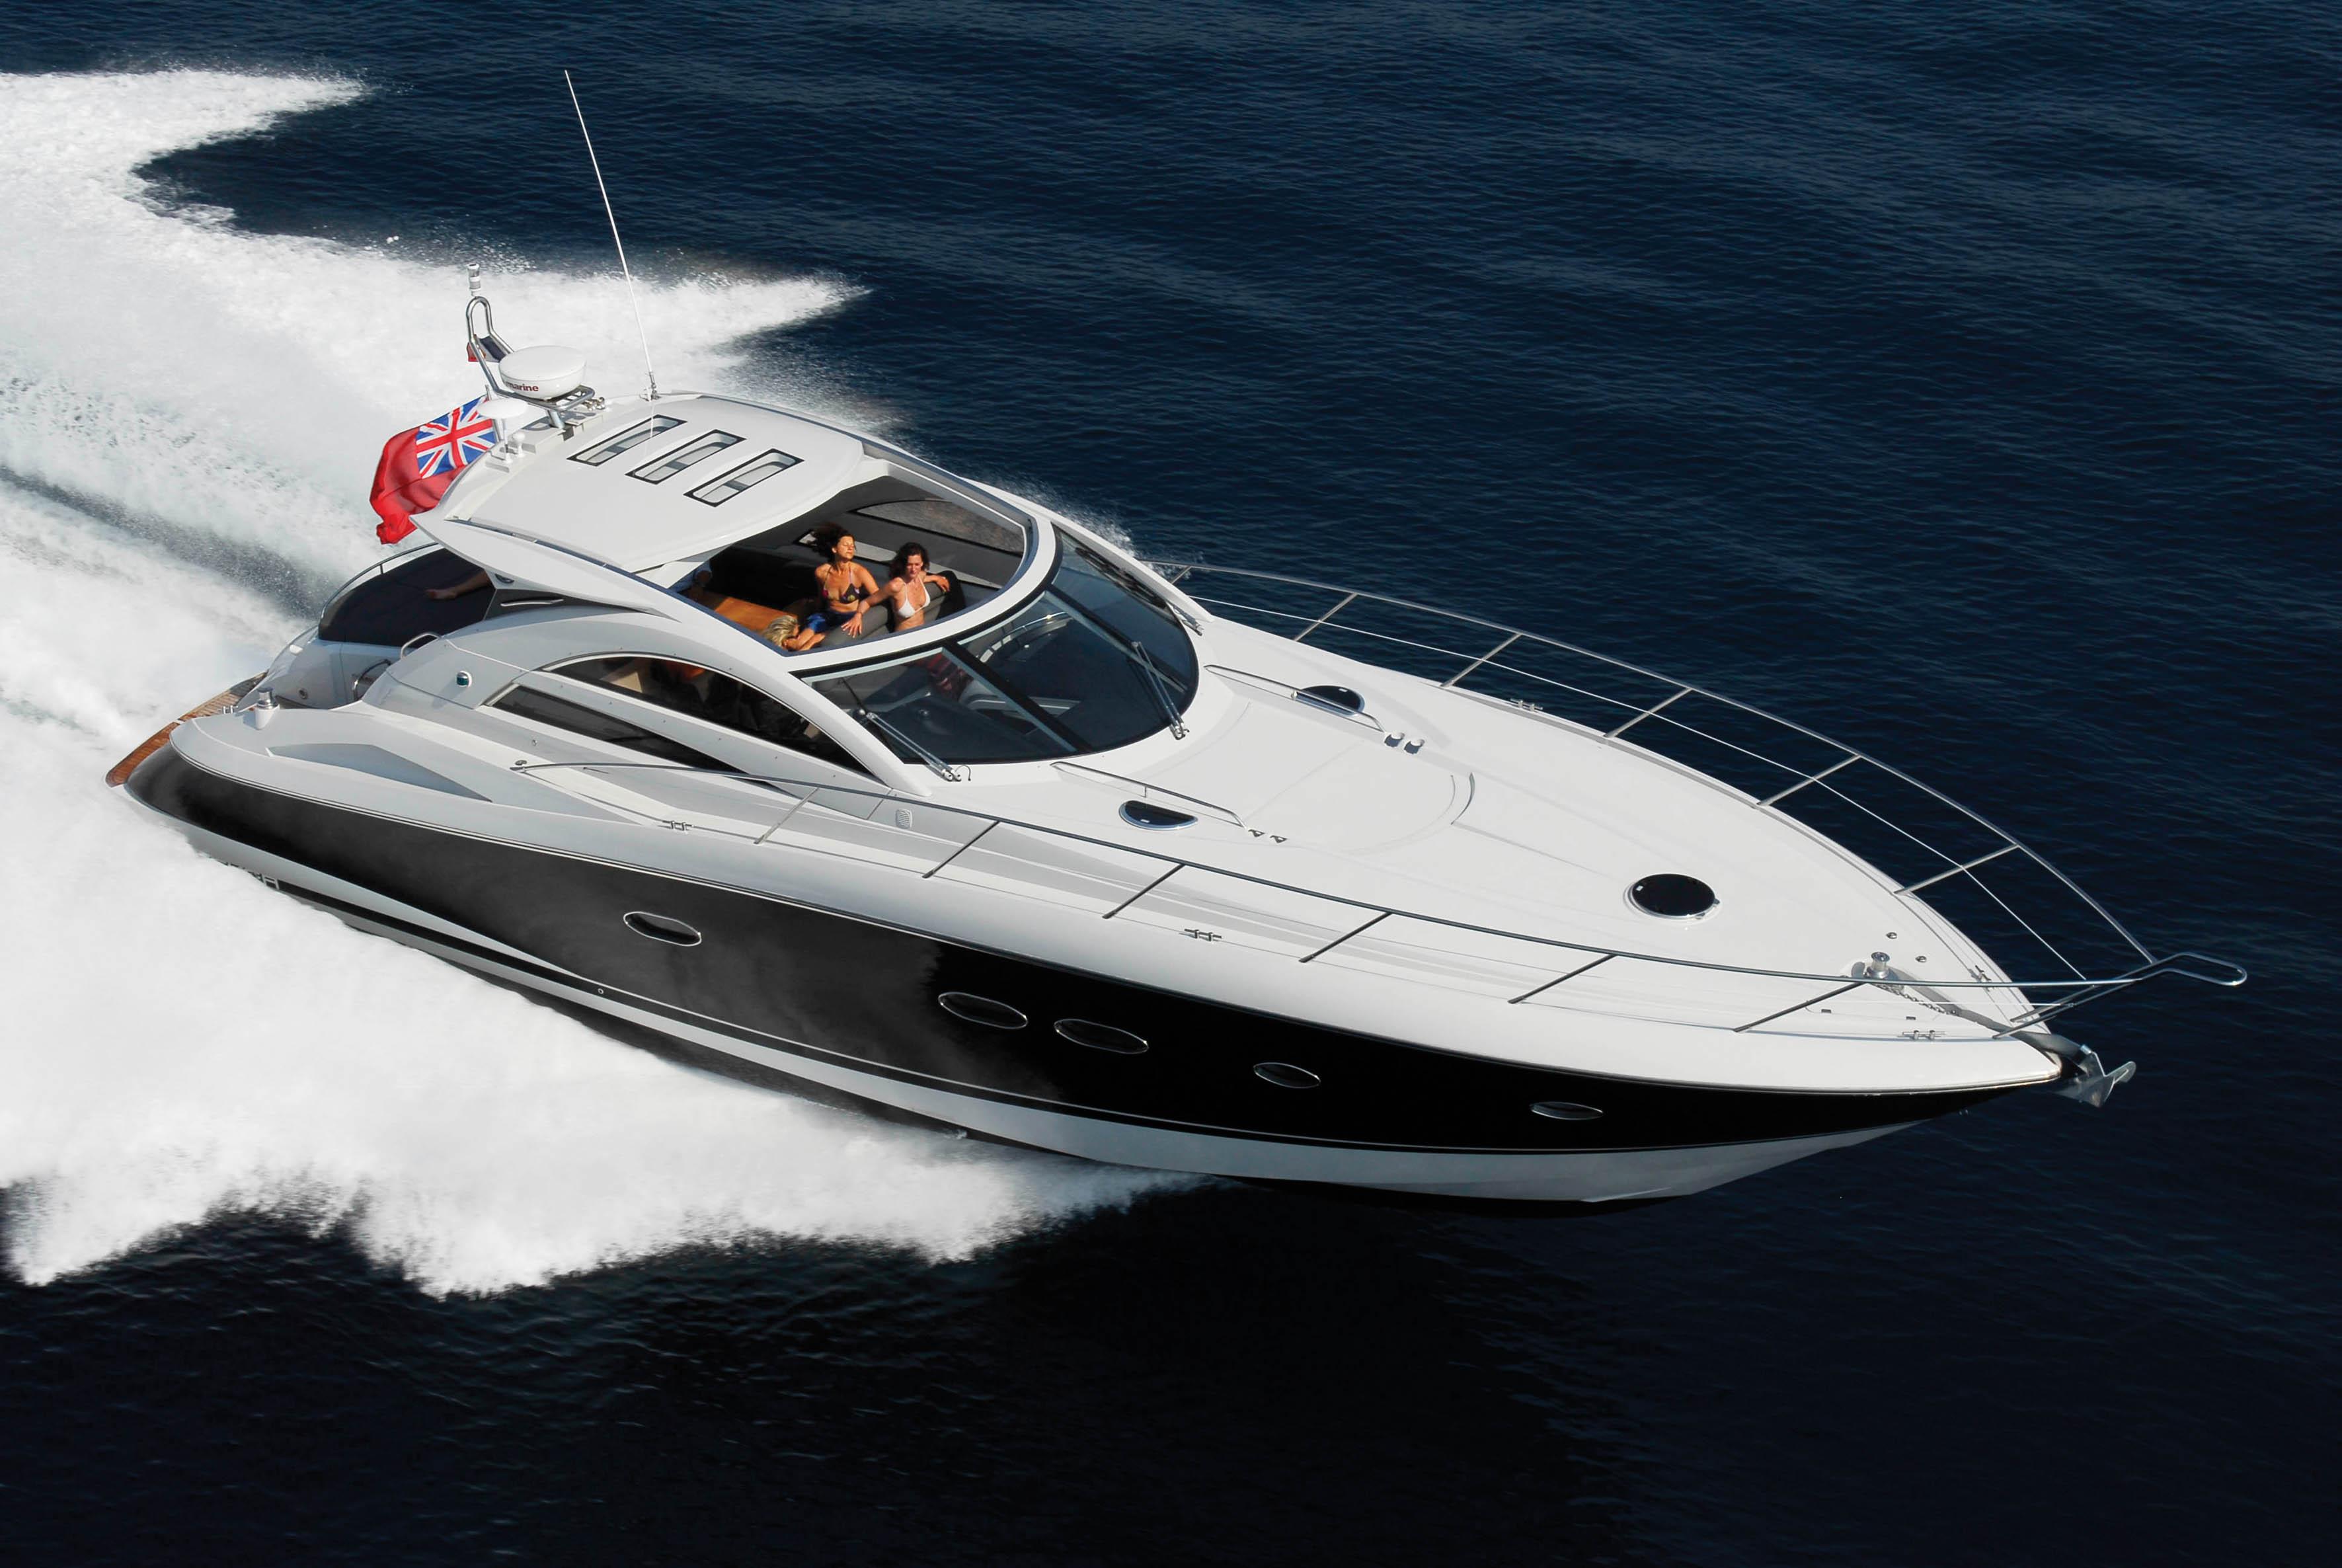 Sunseeker Portofino 53 для продажи